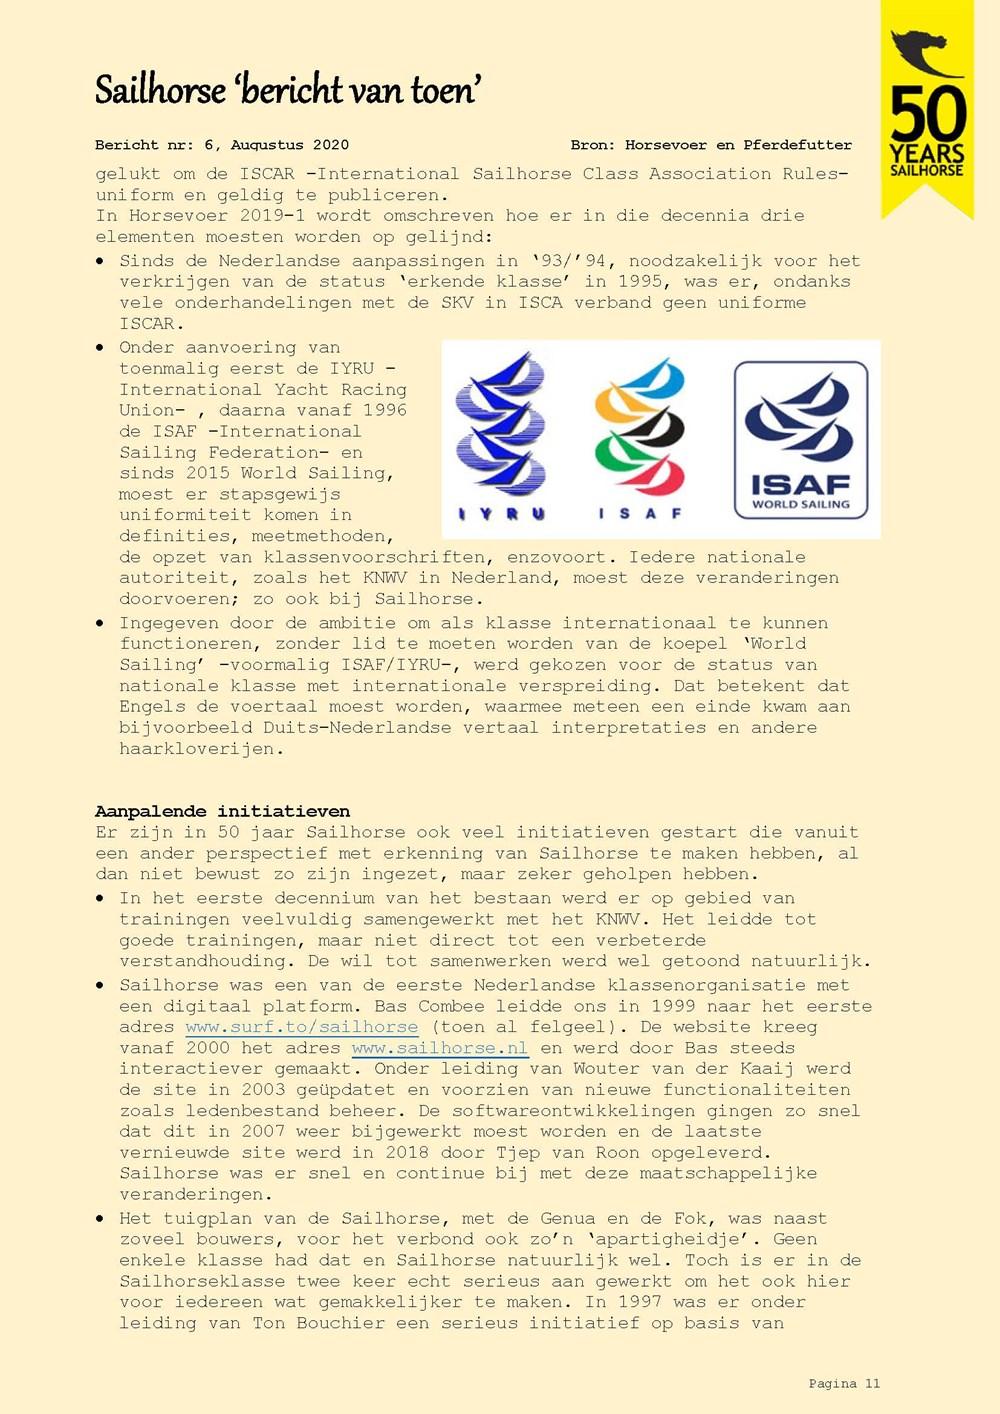 BvT06_3_Page_11.jpg